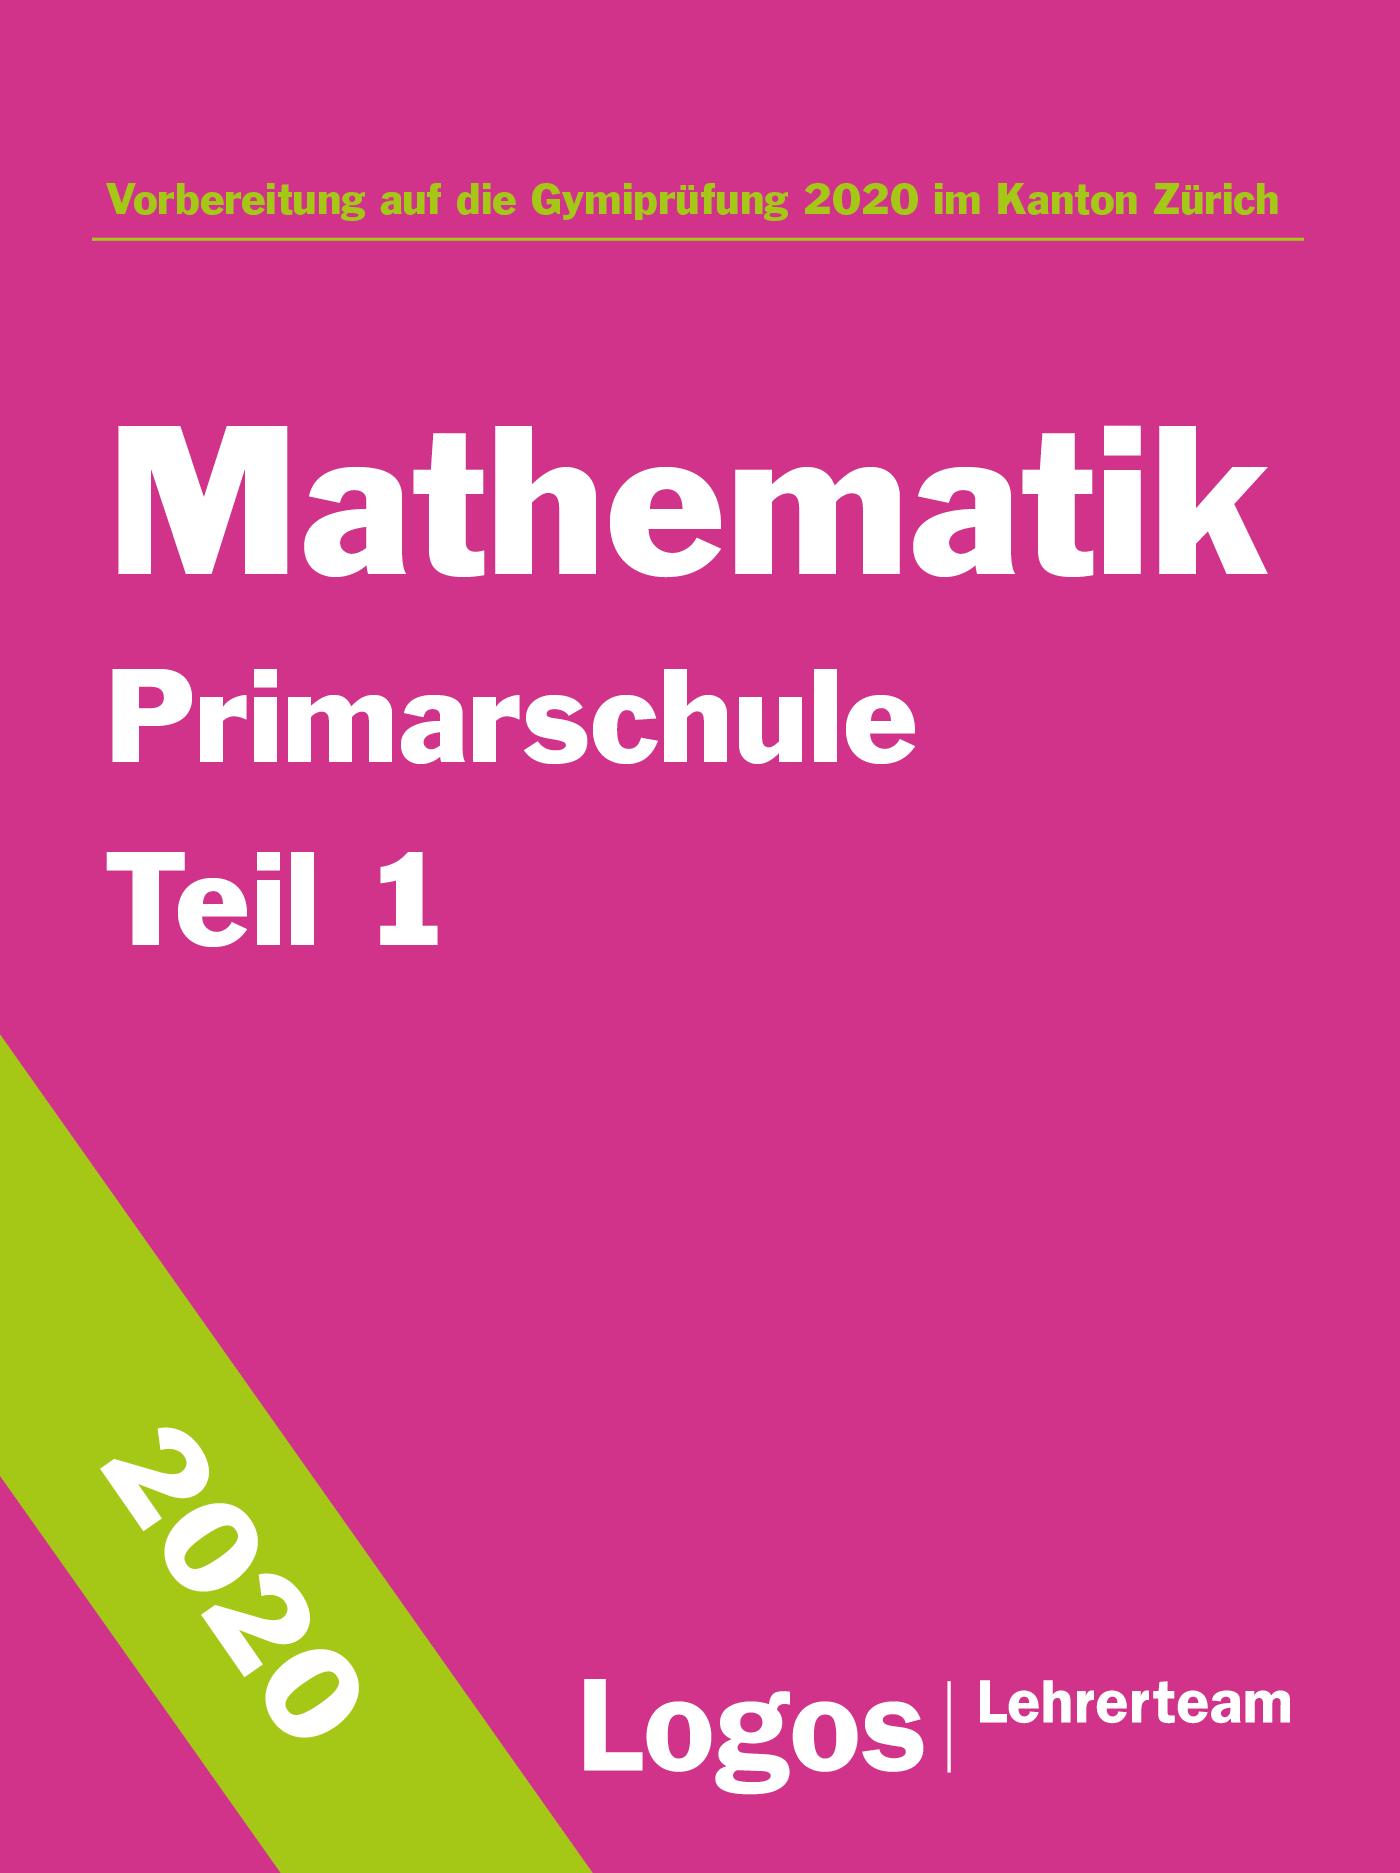 Gymivorbereitung Primar Mathematik Teil 1